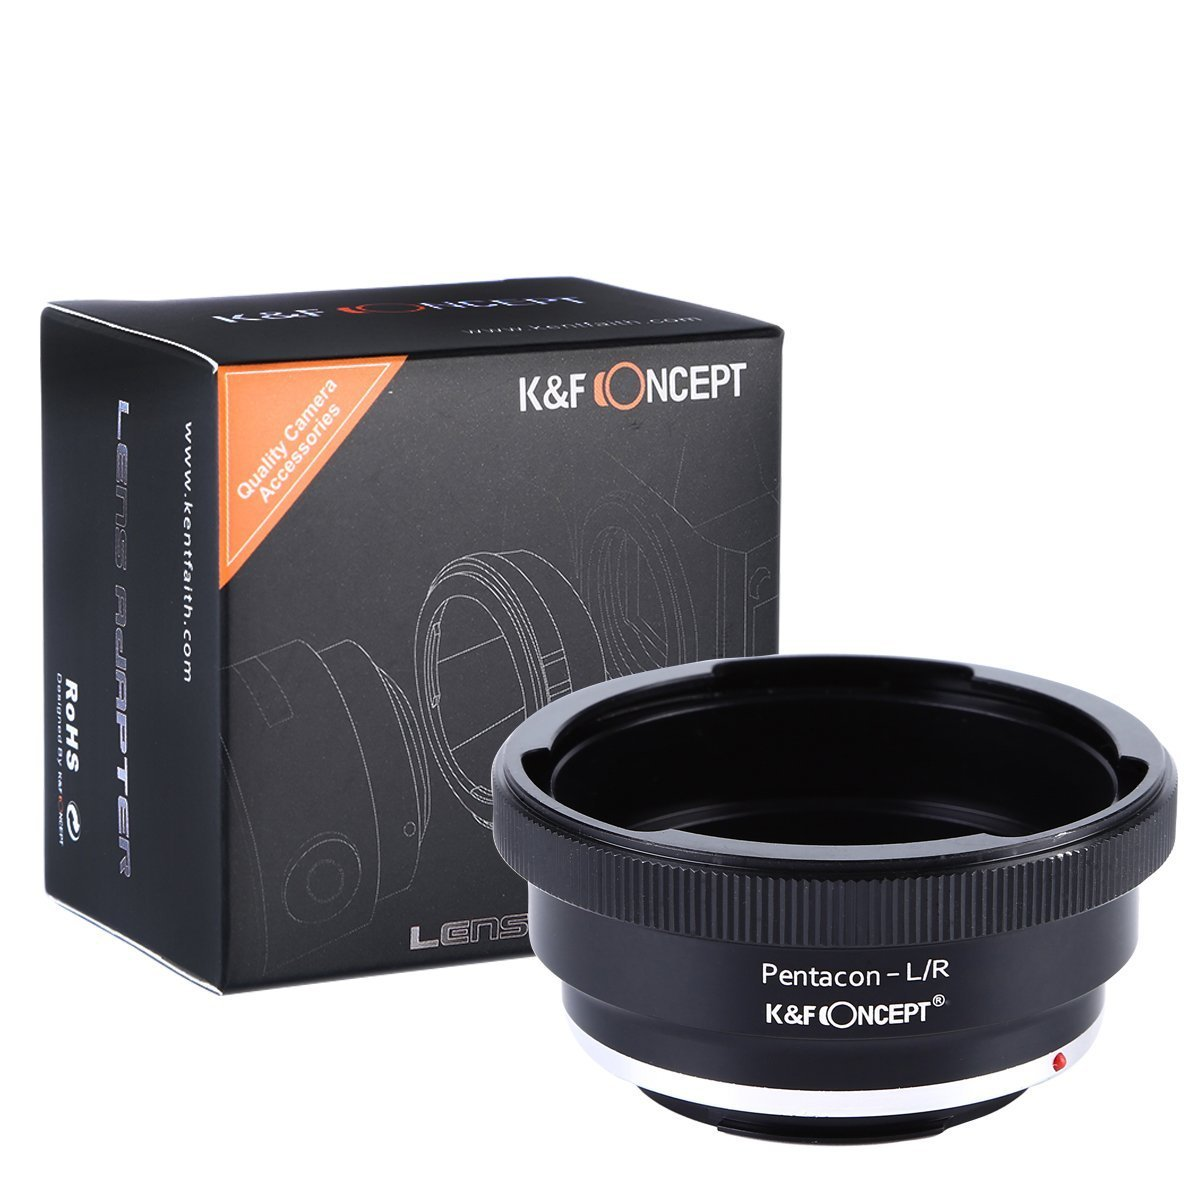 K&F Concept Pentacon 6 Kiev 60 Lens to Leica R Camera Body